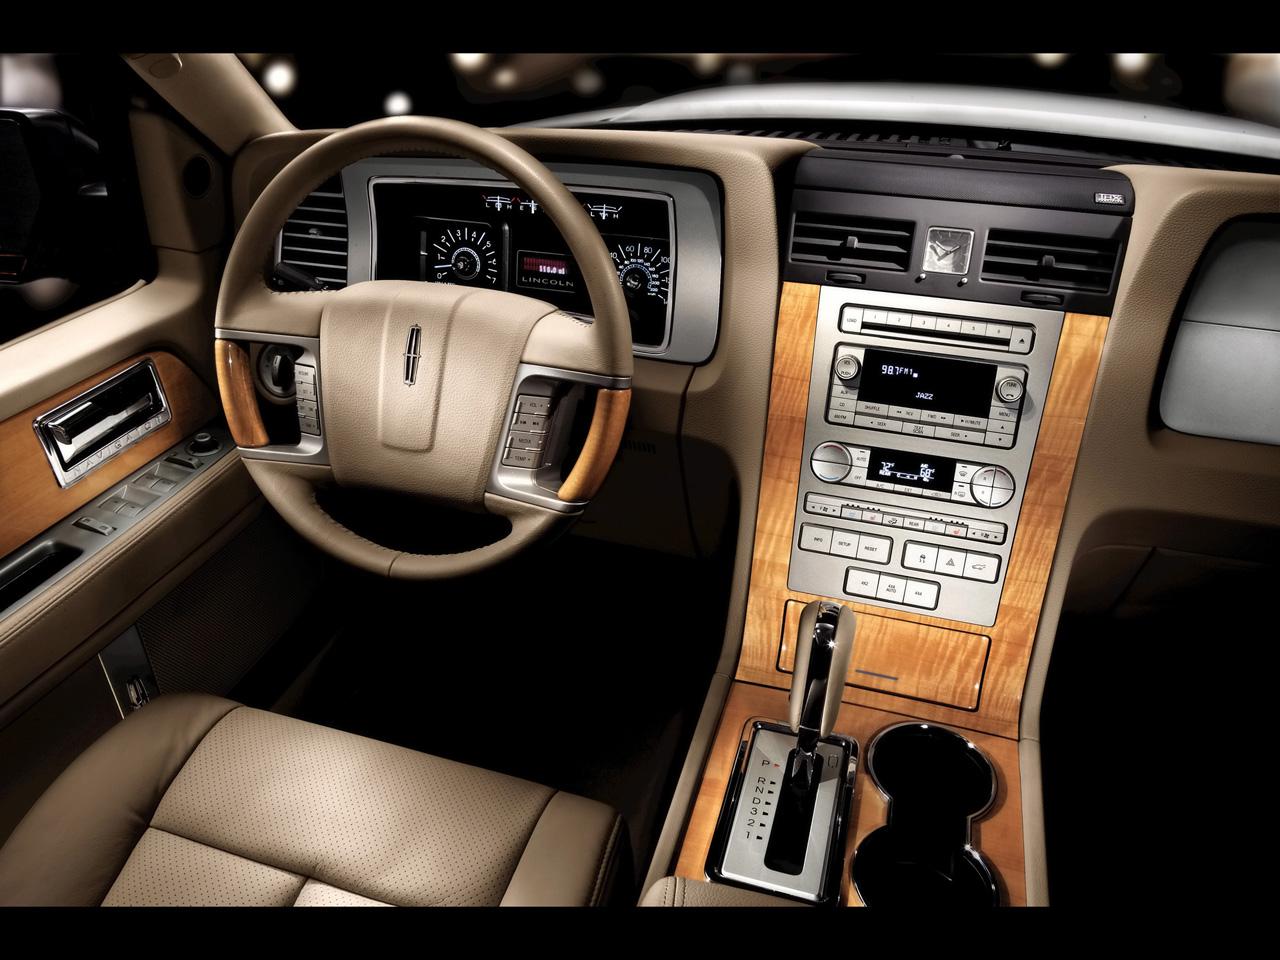 2008 Lincoln Navigator - Information and photos - Zomb Drive